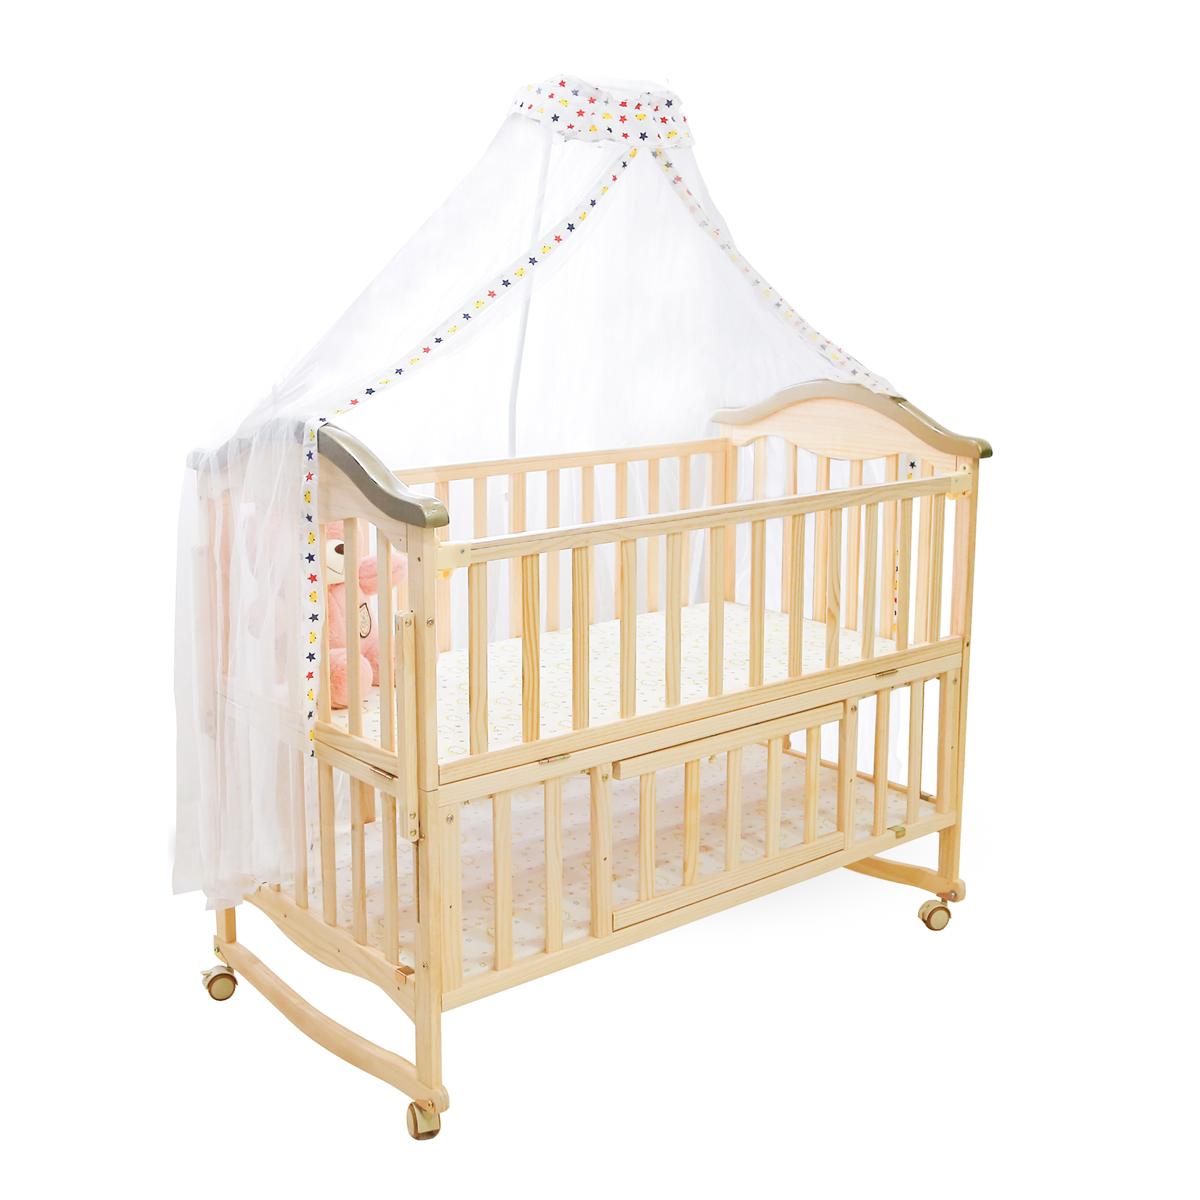 Set giường cũi cho bé KidsPlaza Natural Compact